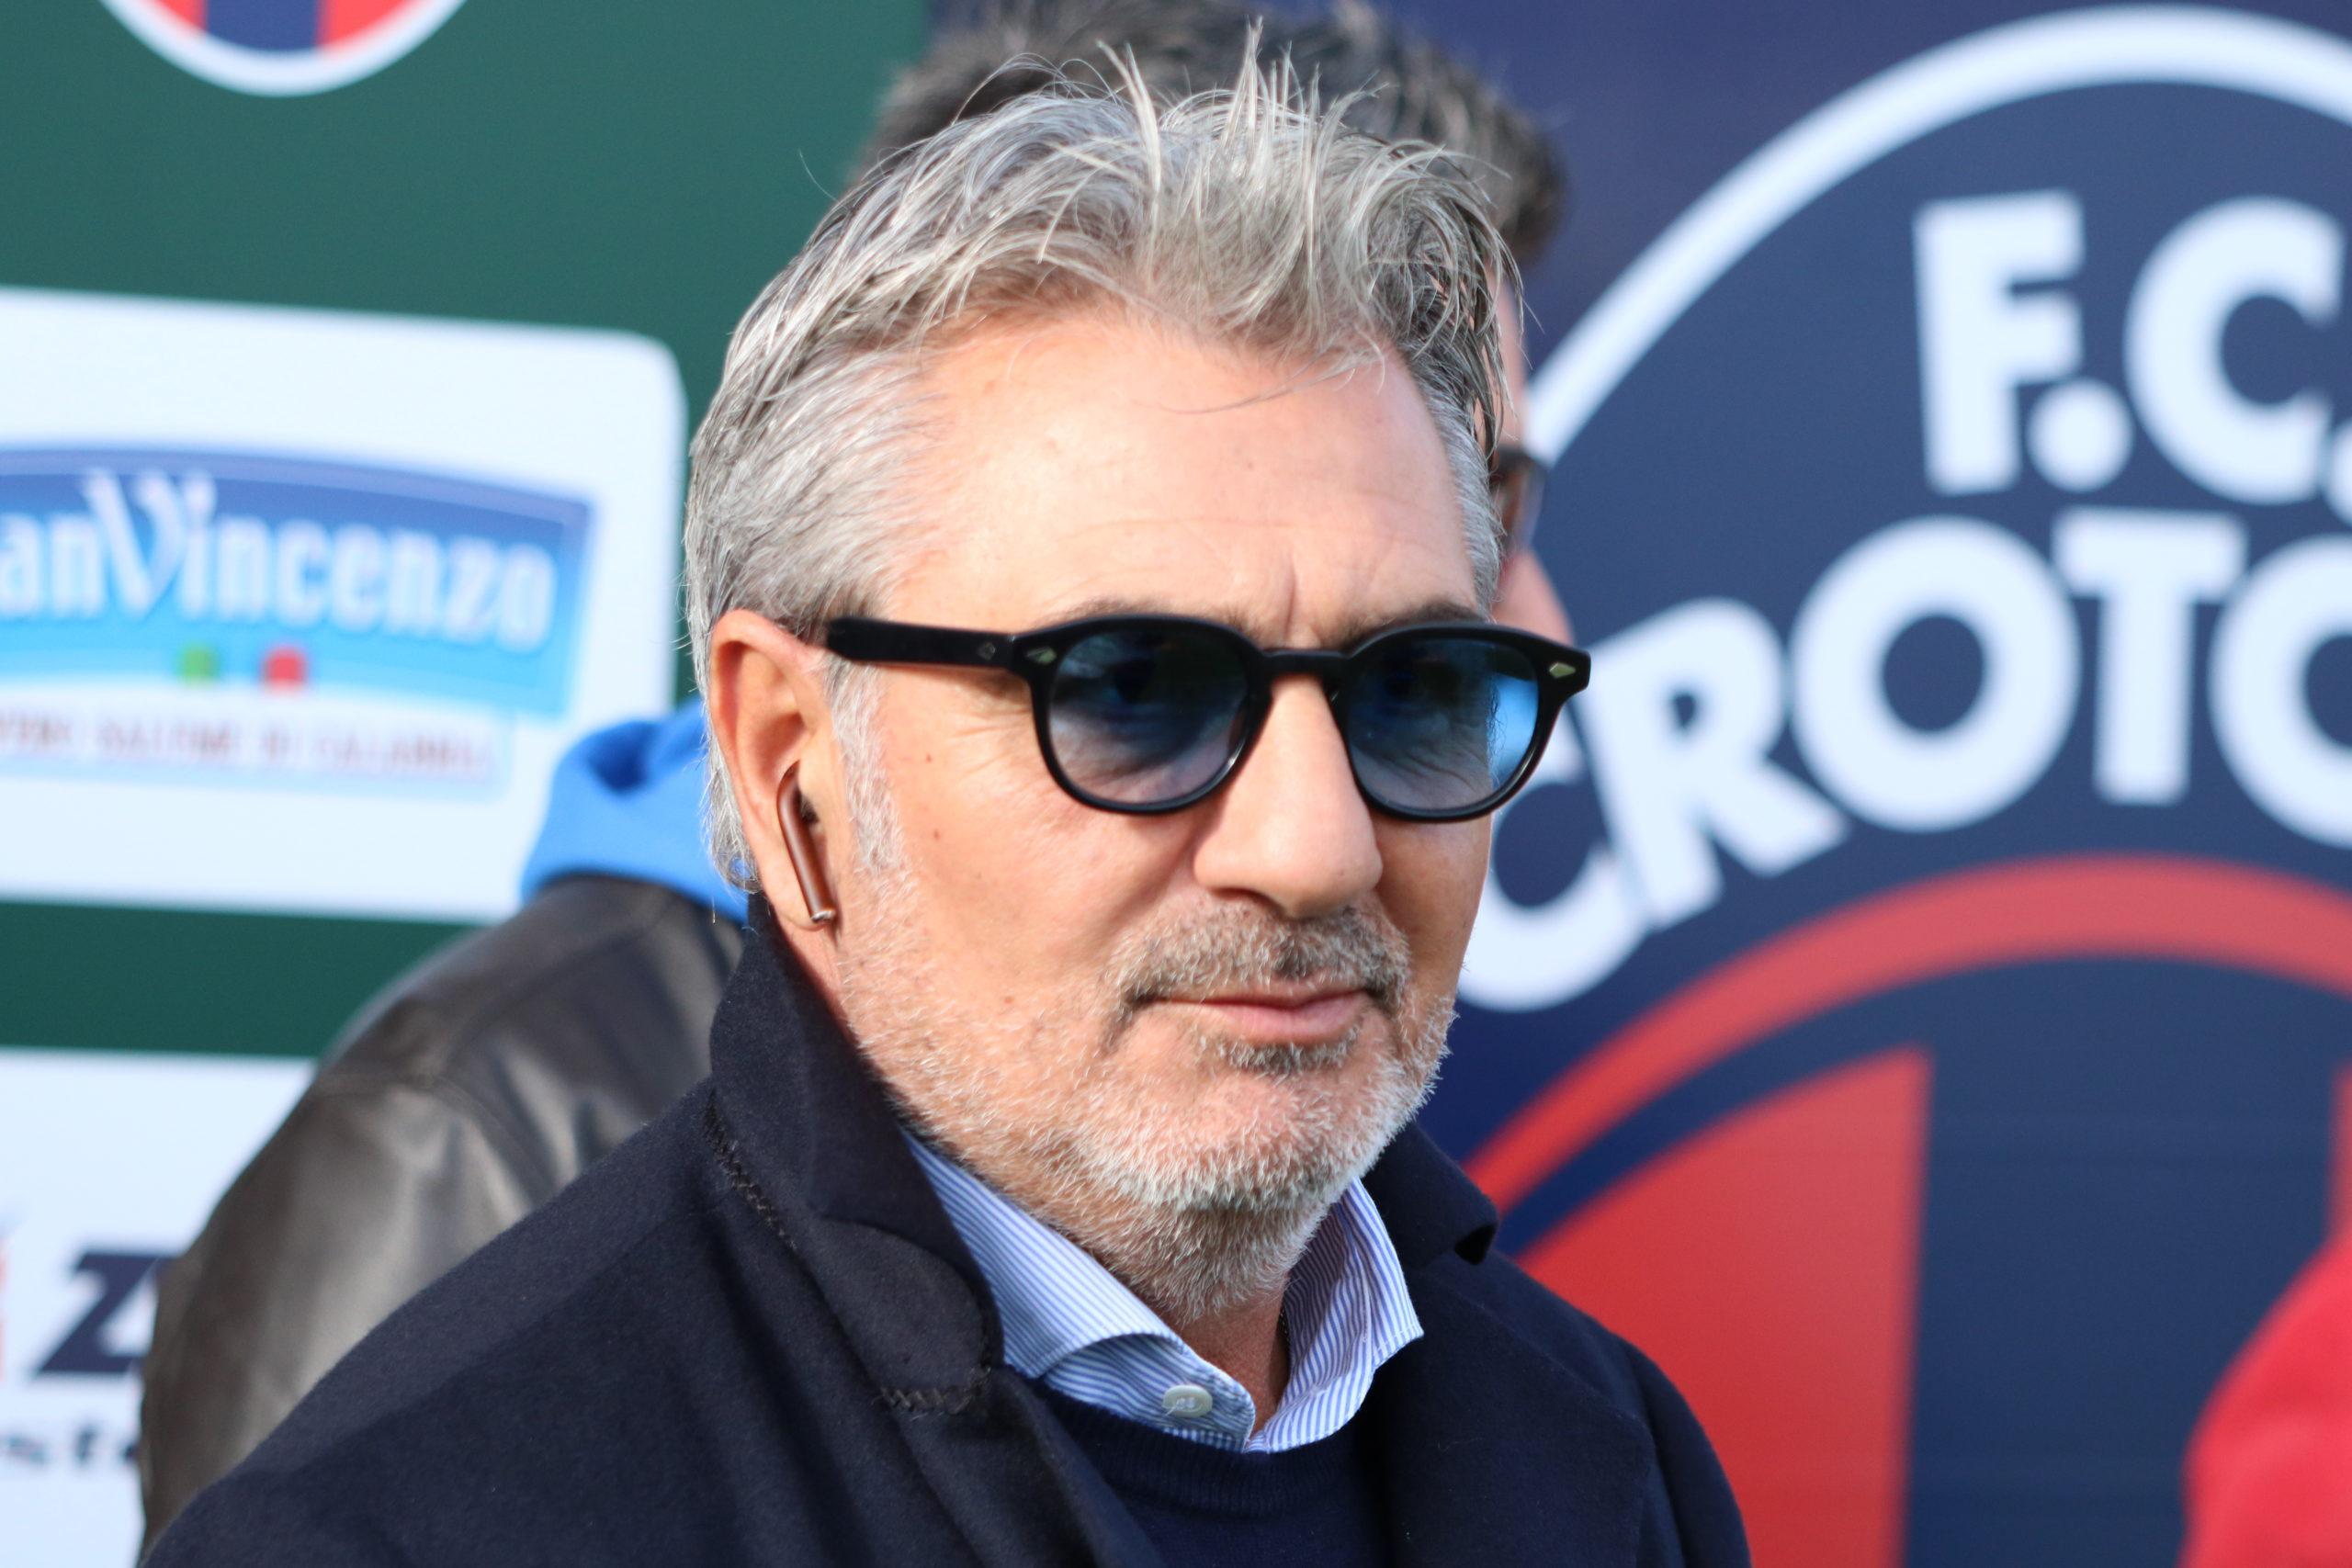 Sospensione campionati, la nota del Presidente Gianni Vrenna